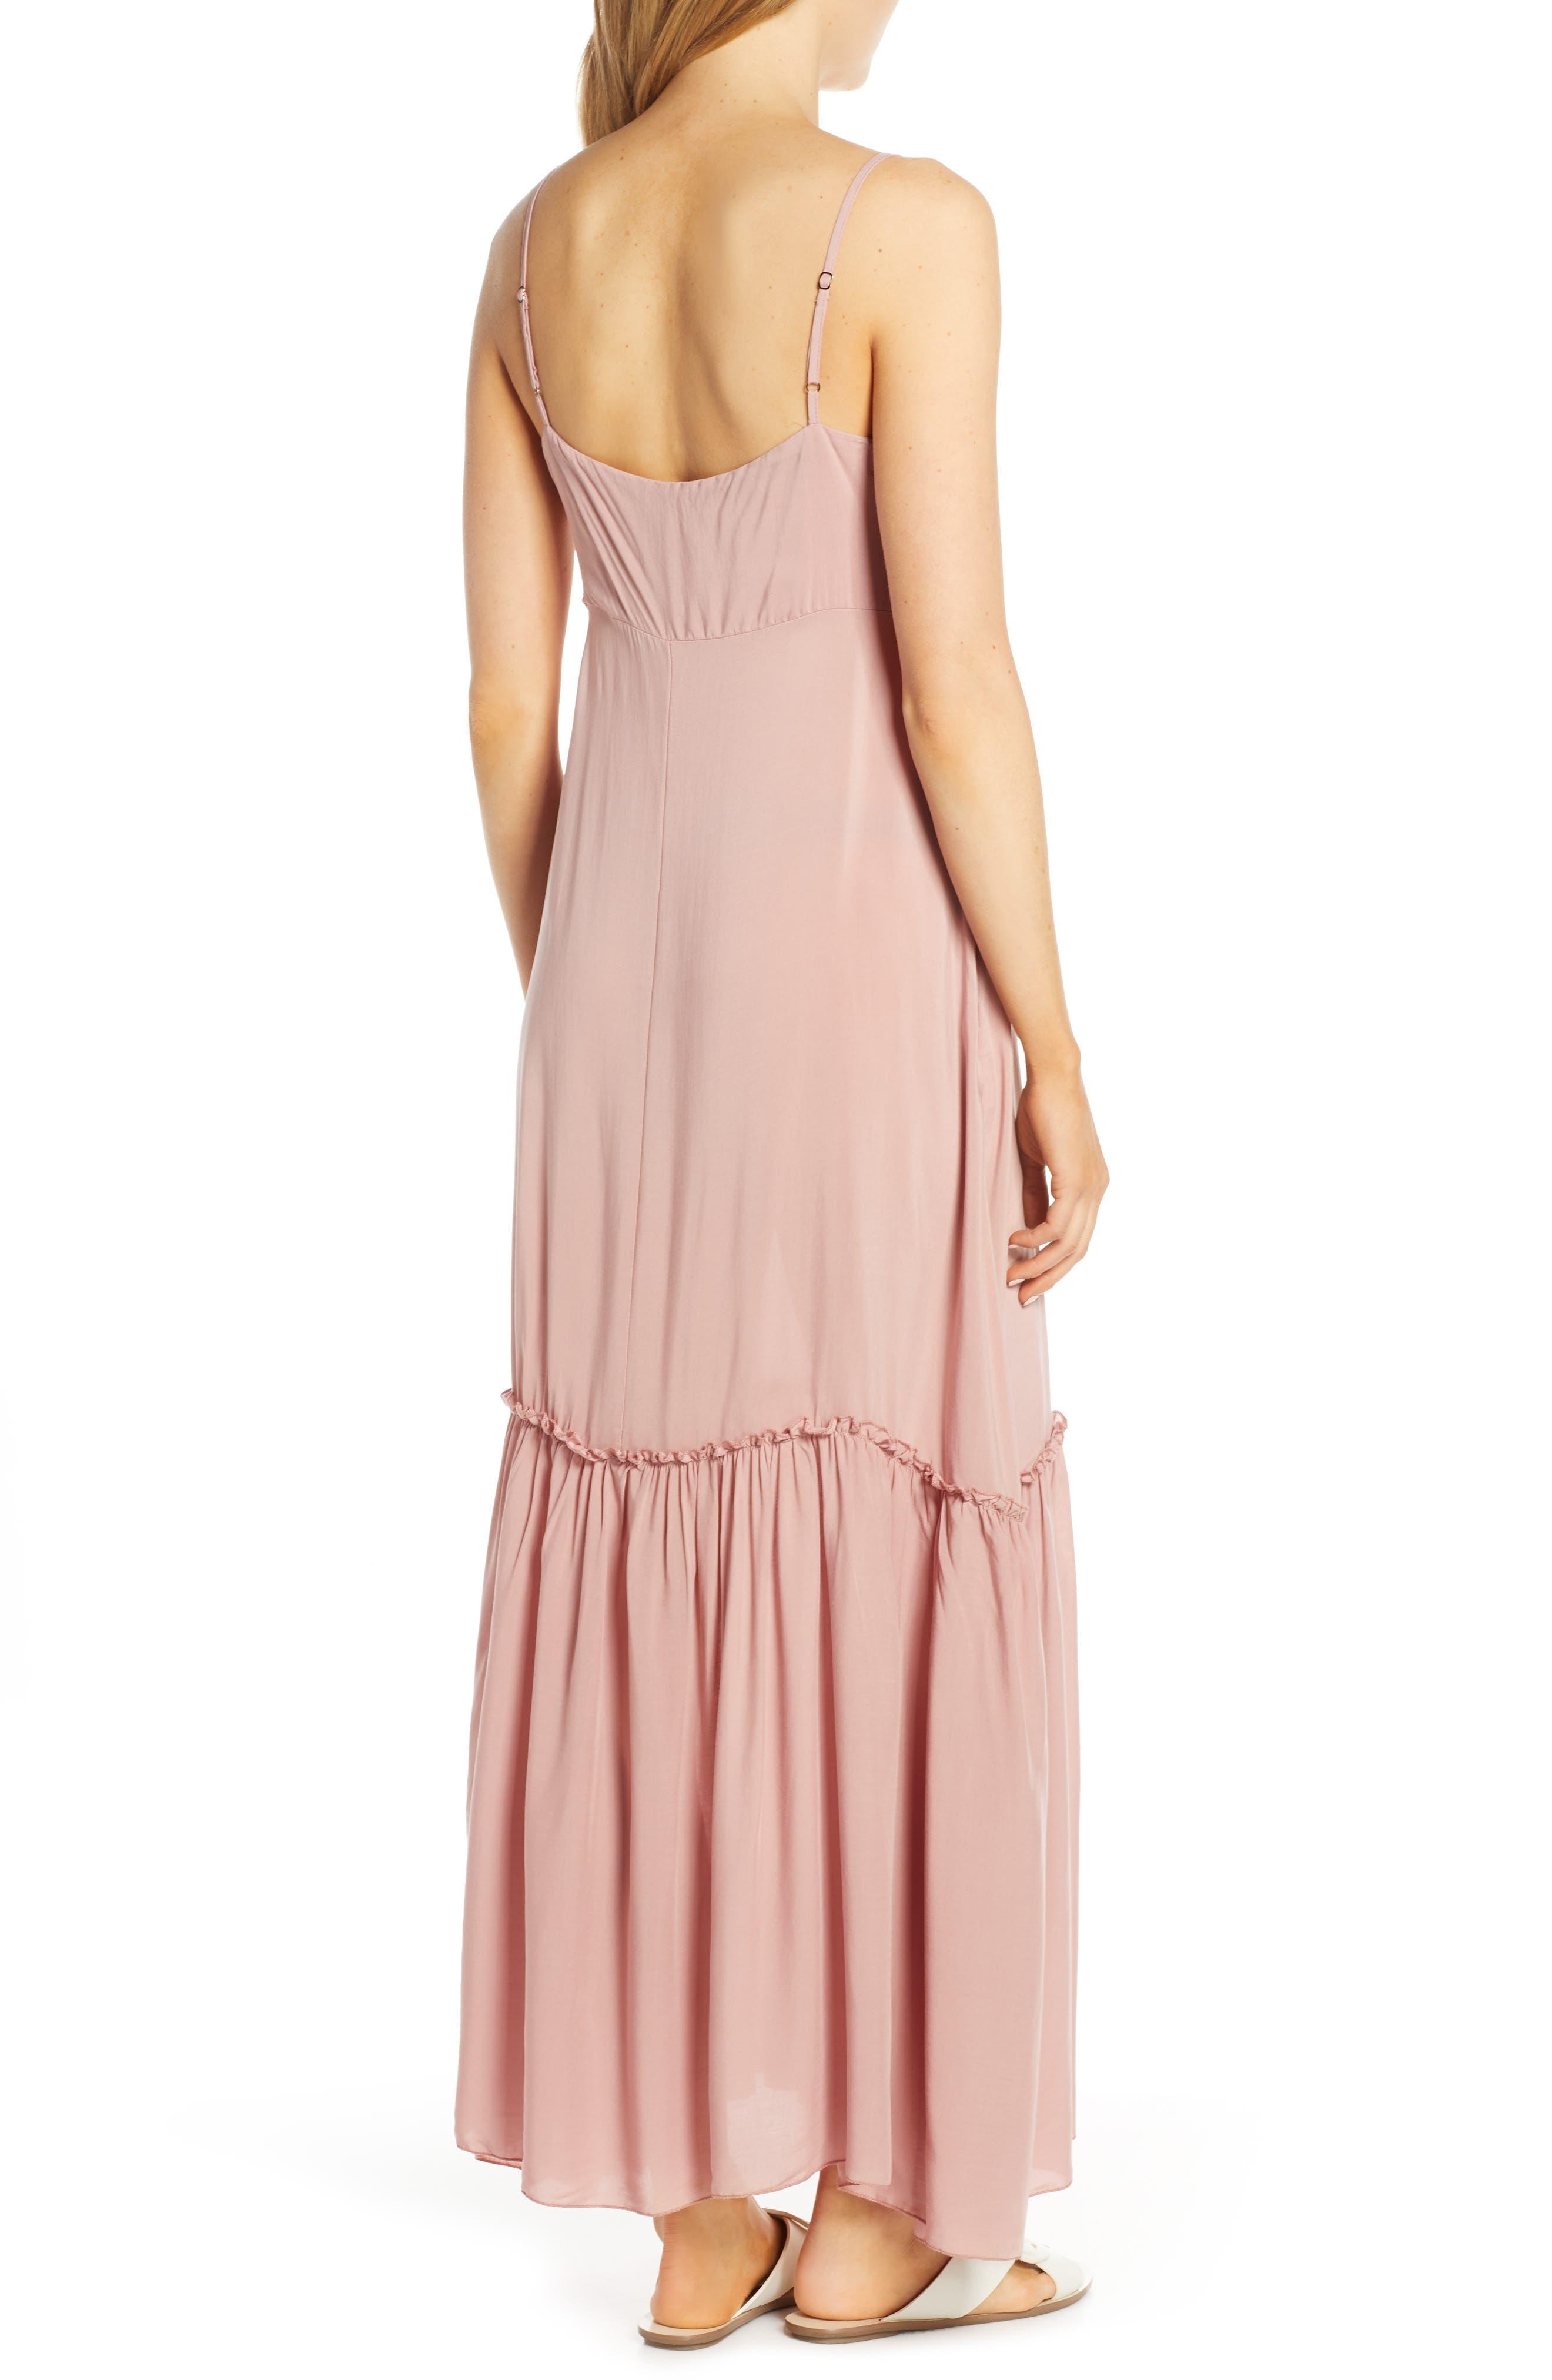 ELAN, Maxi Cover-Up Dress, Alternate thumbnail 2, color, ROSE